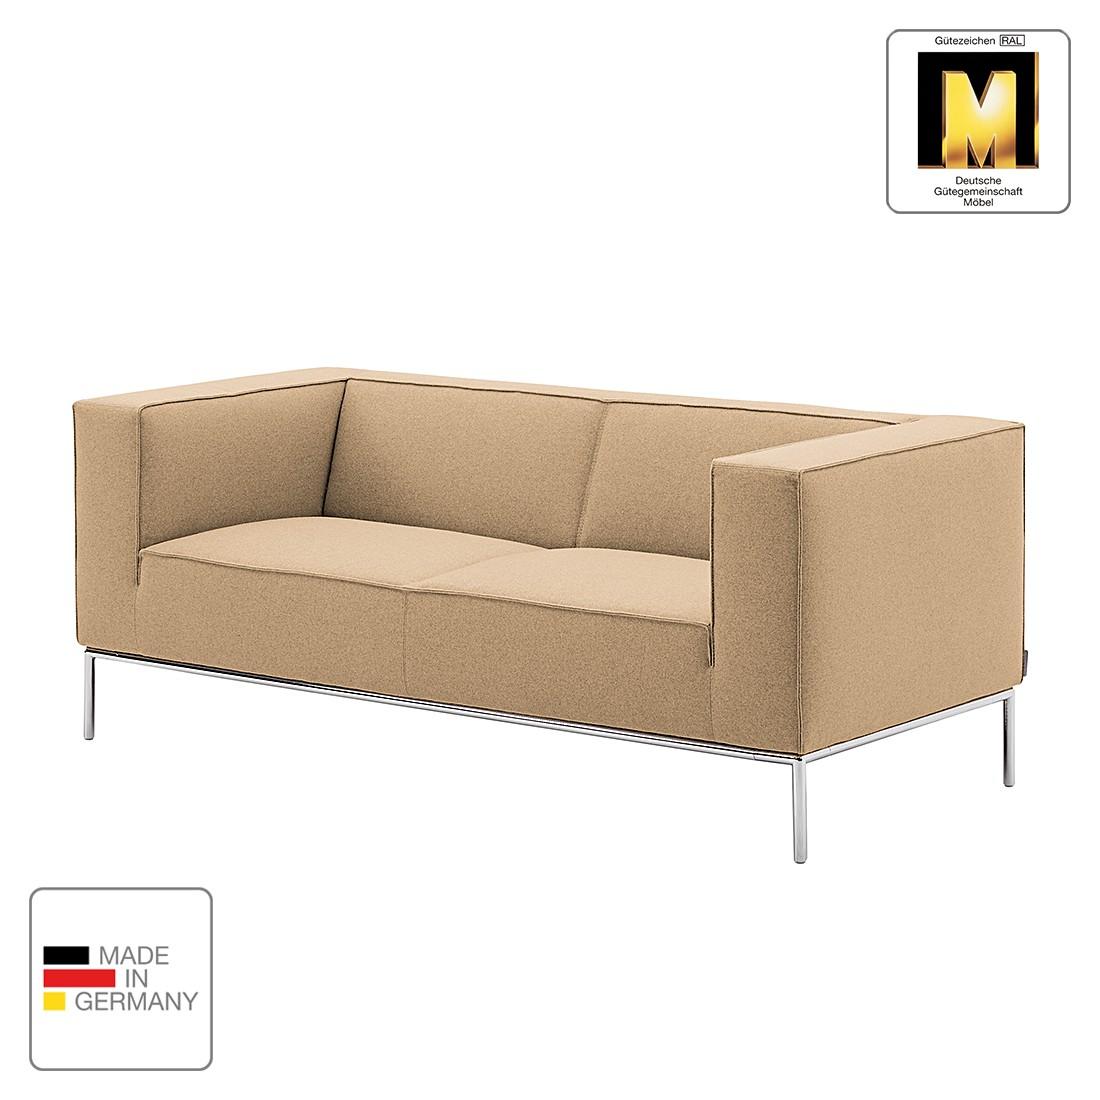 M bel online g nstig kaufen ber shop24 for Sofa ohne kissen